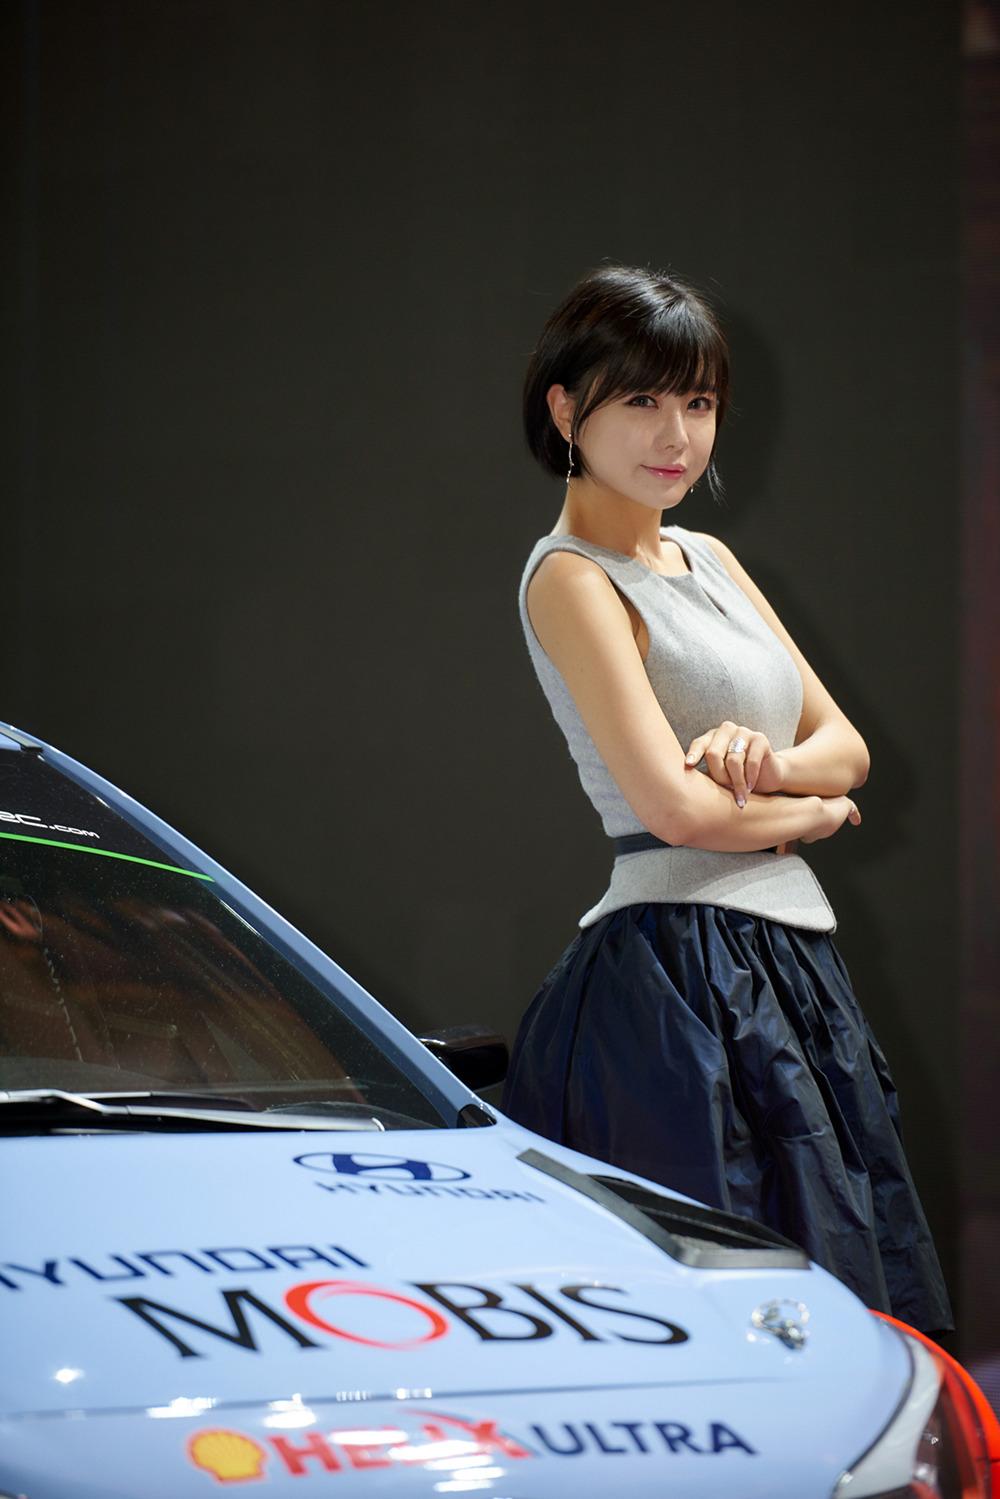 HYUNDAI Model - 류지혜